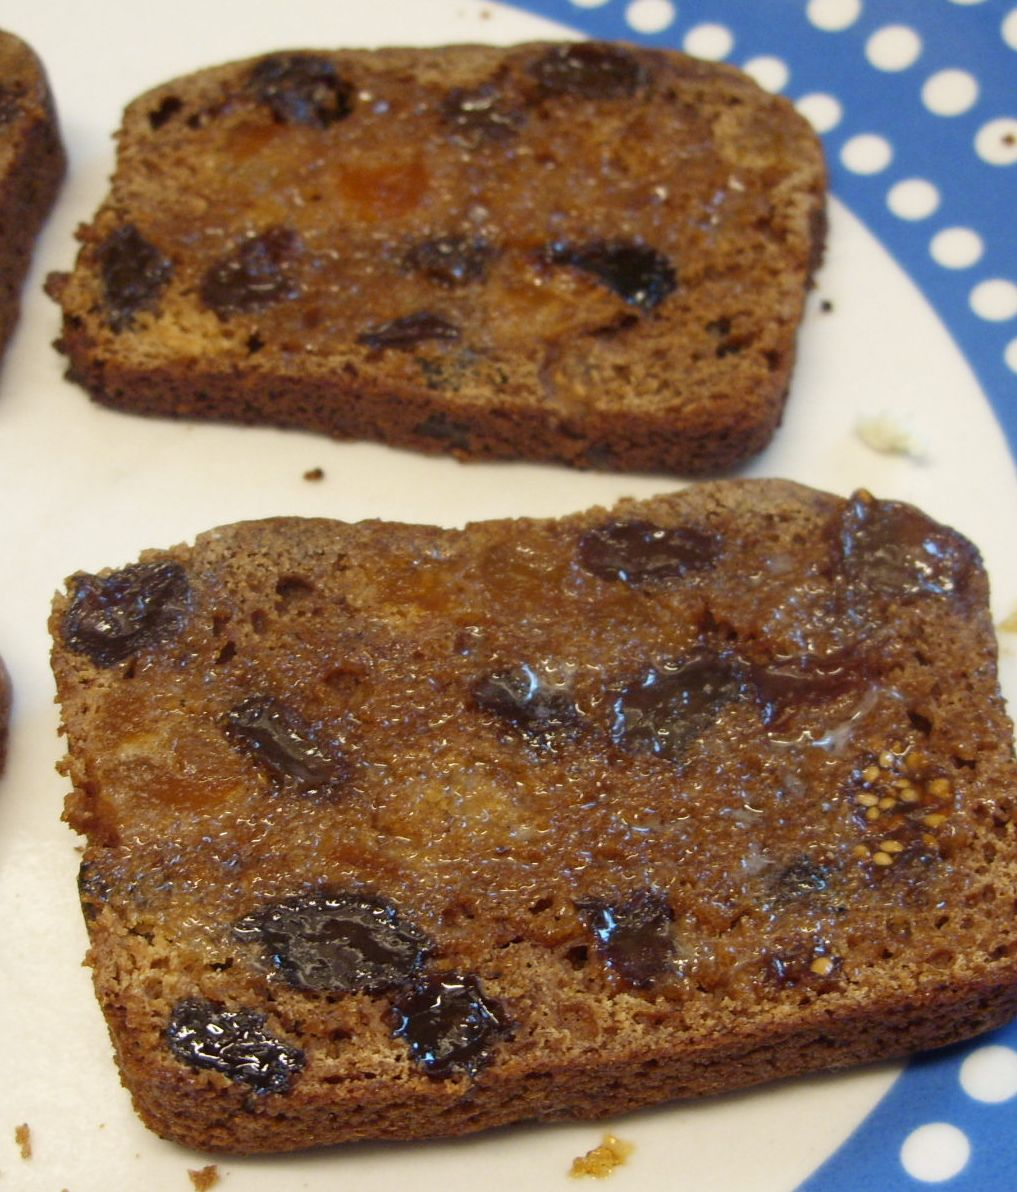 Eat The Blog: The Malt Loaf Experiment